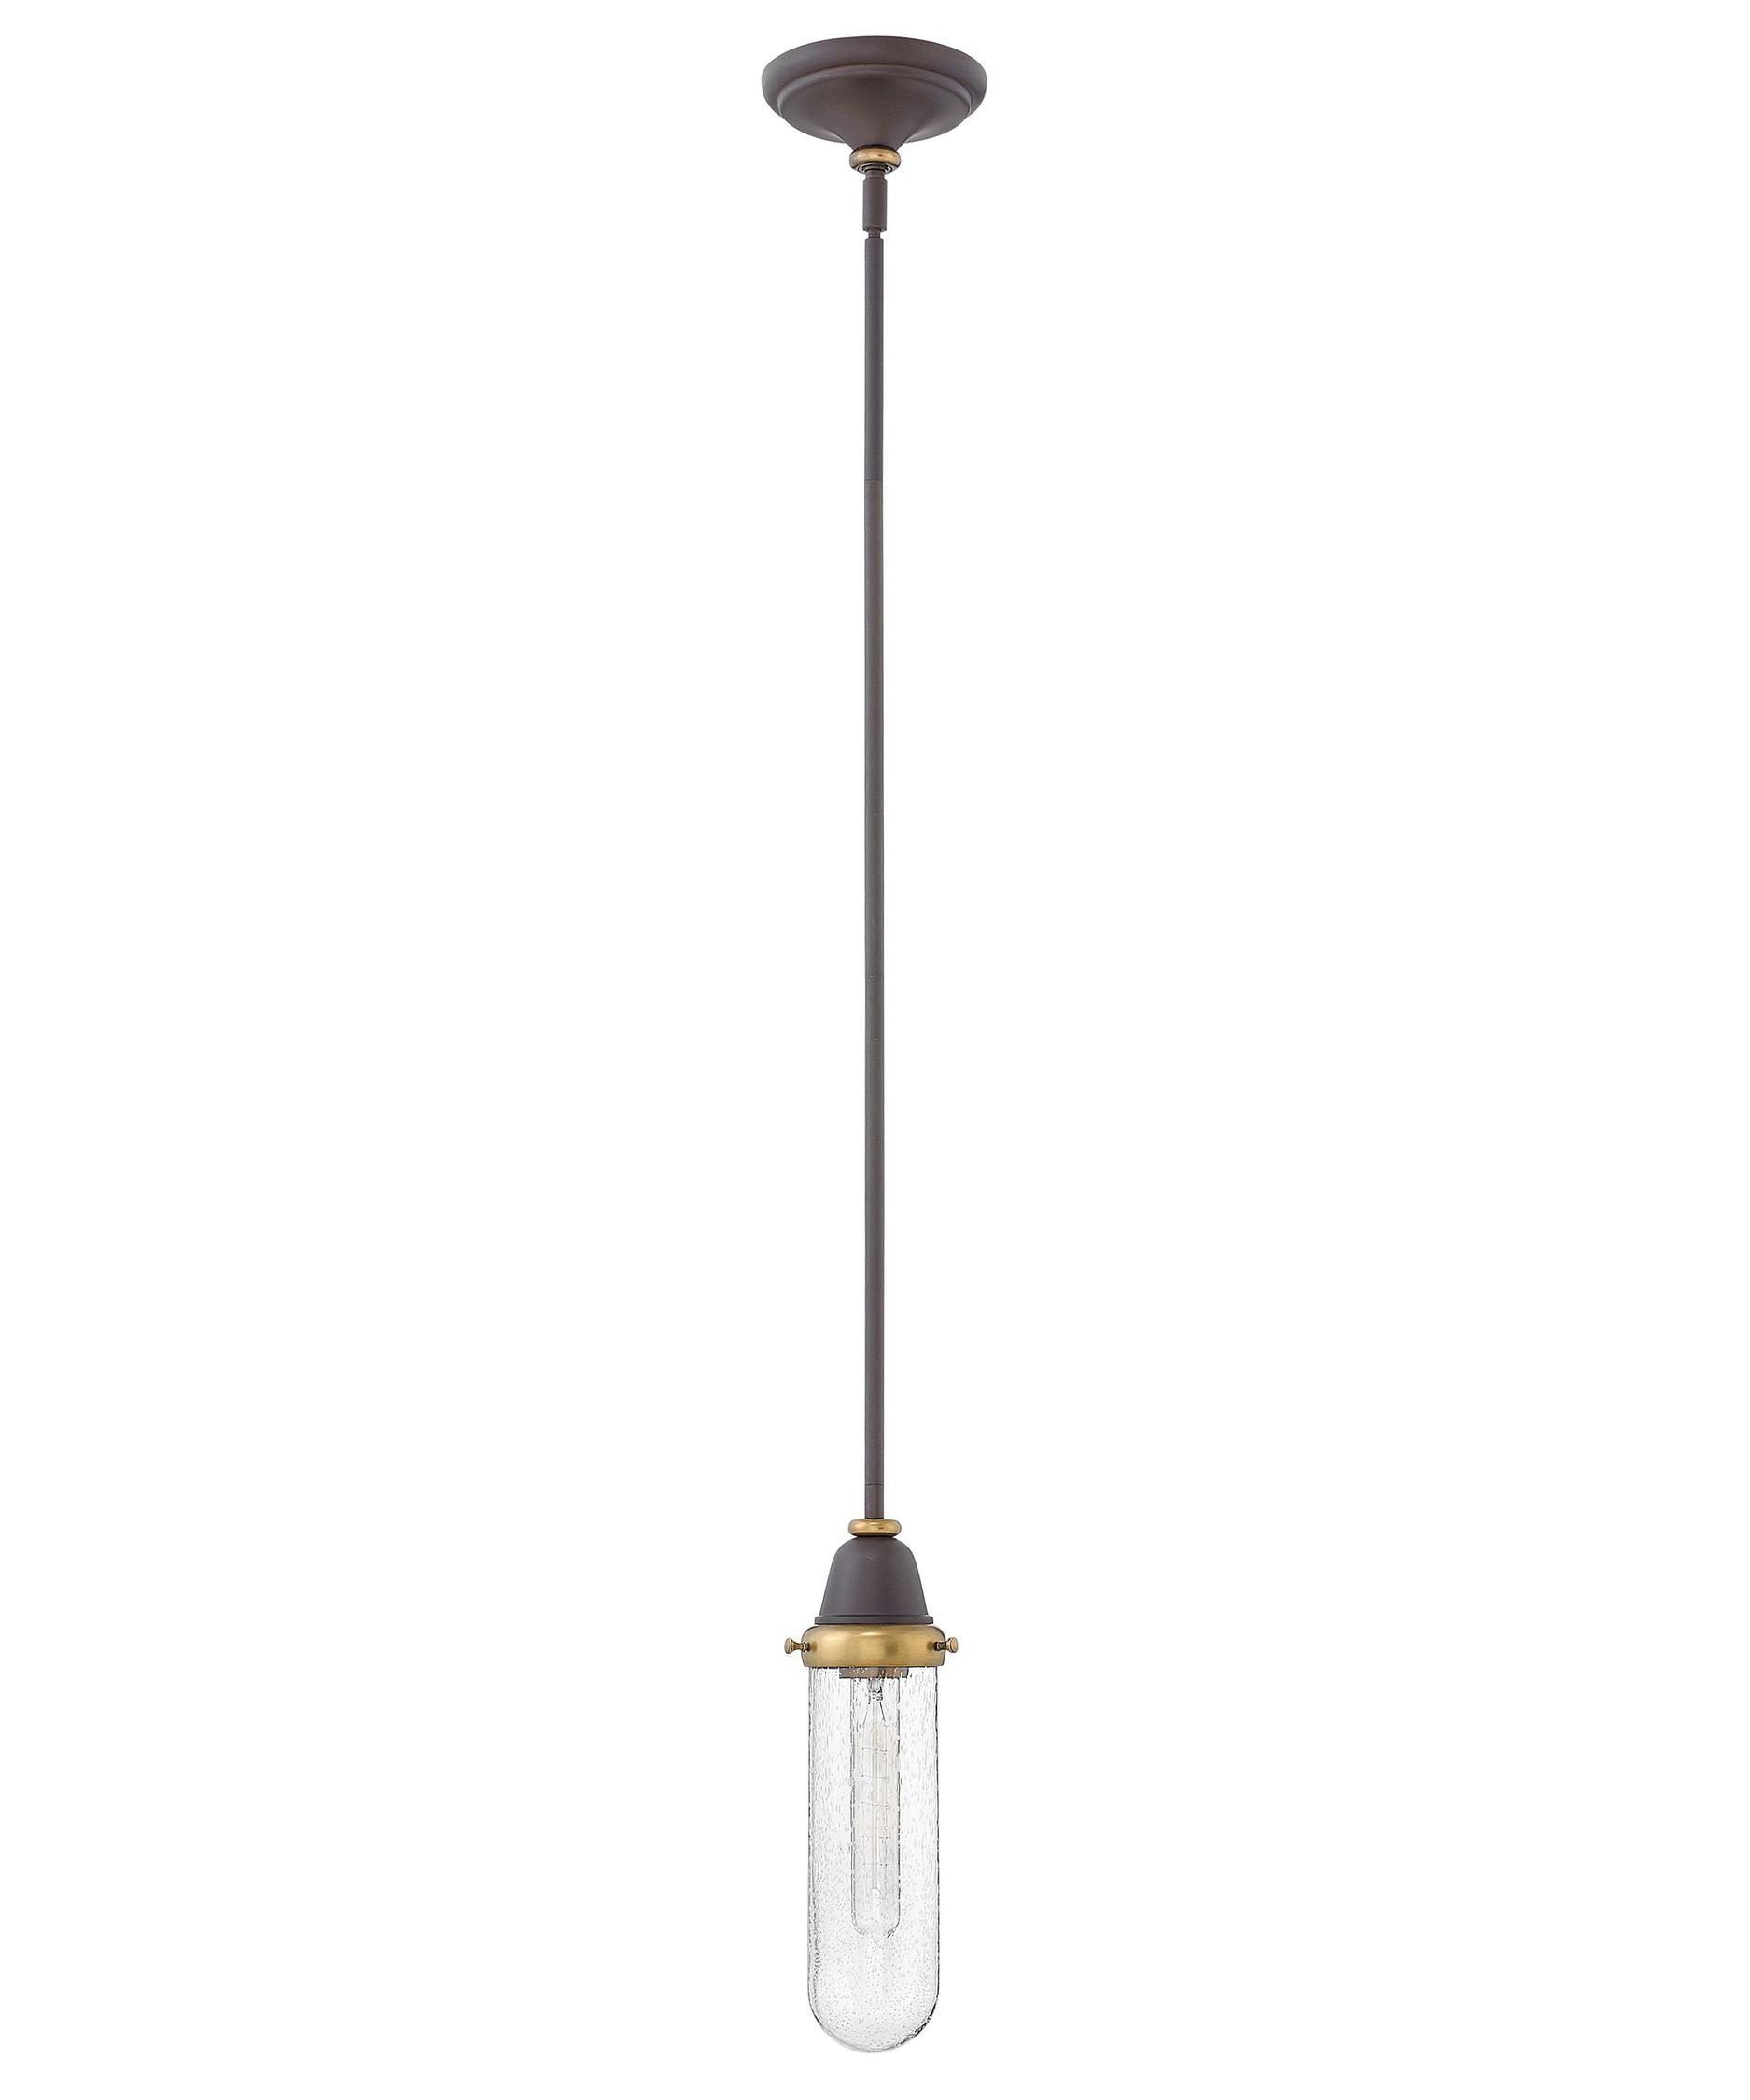 Hinkley lighting academy inch wide light mini pendant san